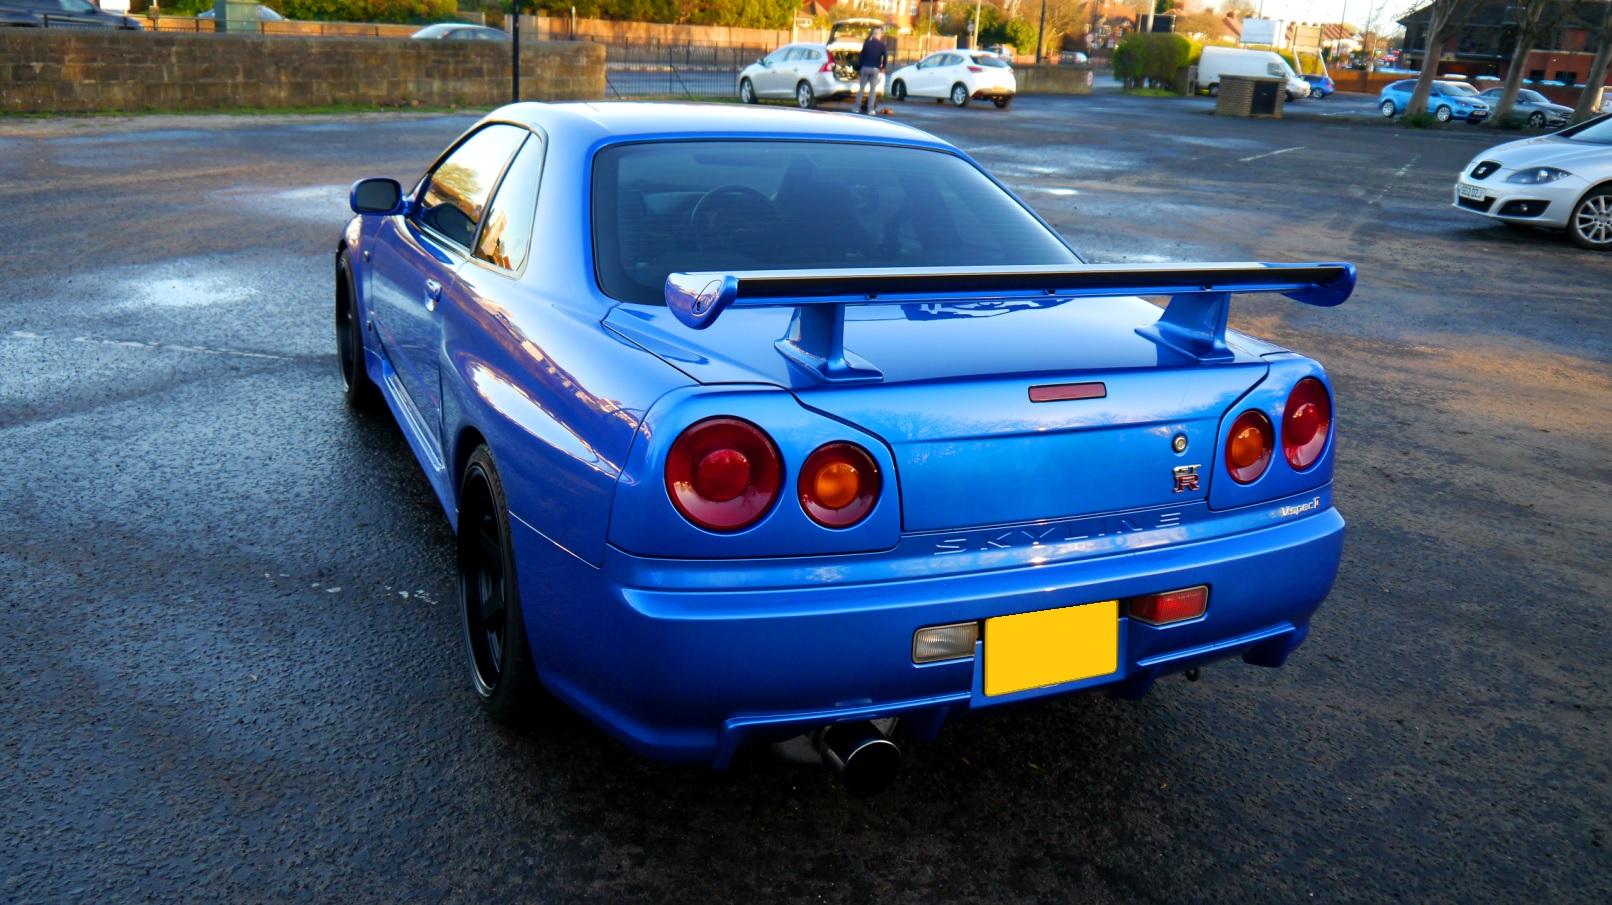 1999 Nissan Skyline R34 GTR 6 Speed Manual - JM-Imports